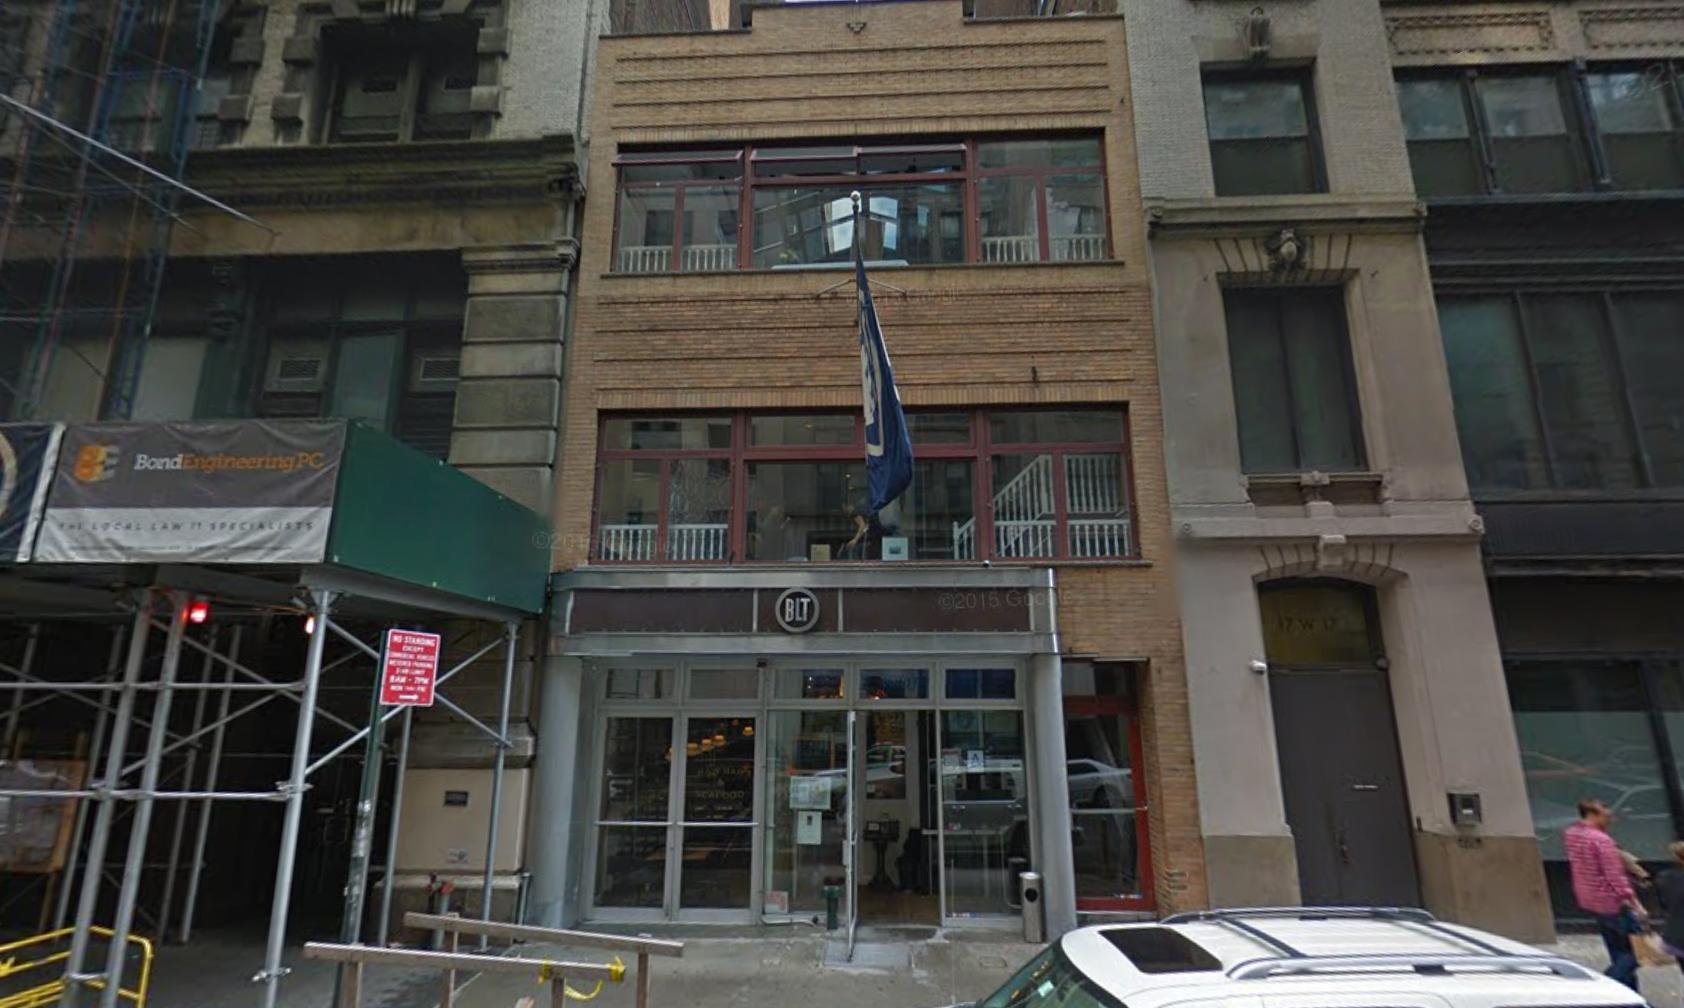 21 West 17th Street